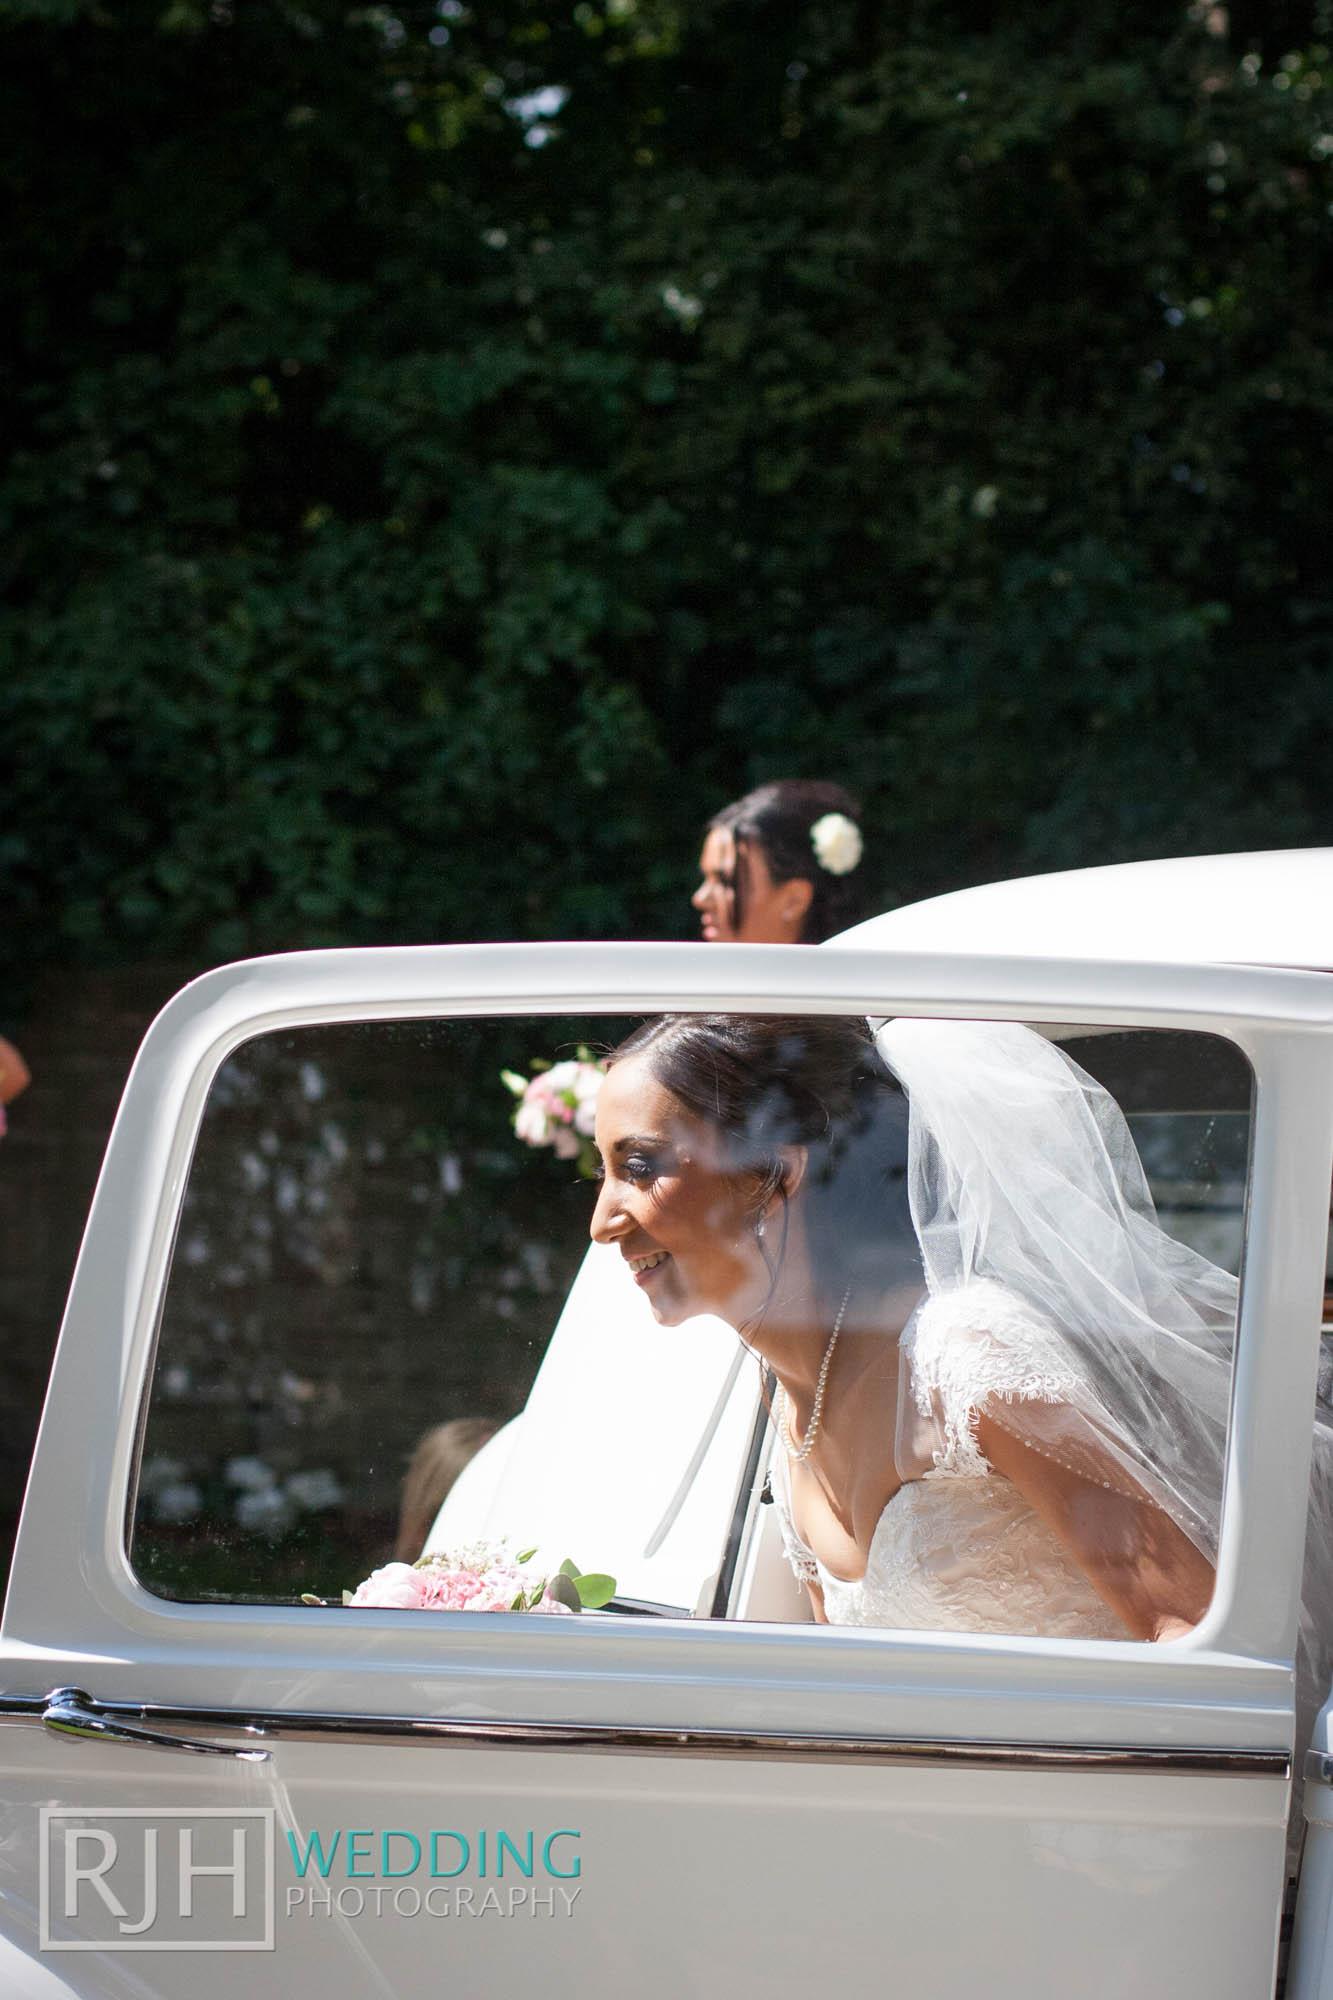 RJH Wedding Photography_Tankersley Manor Wedding_17.jpg